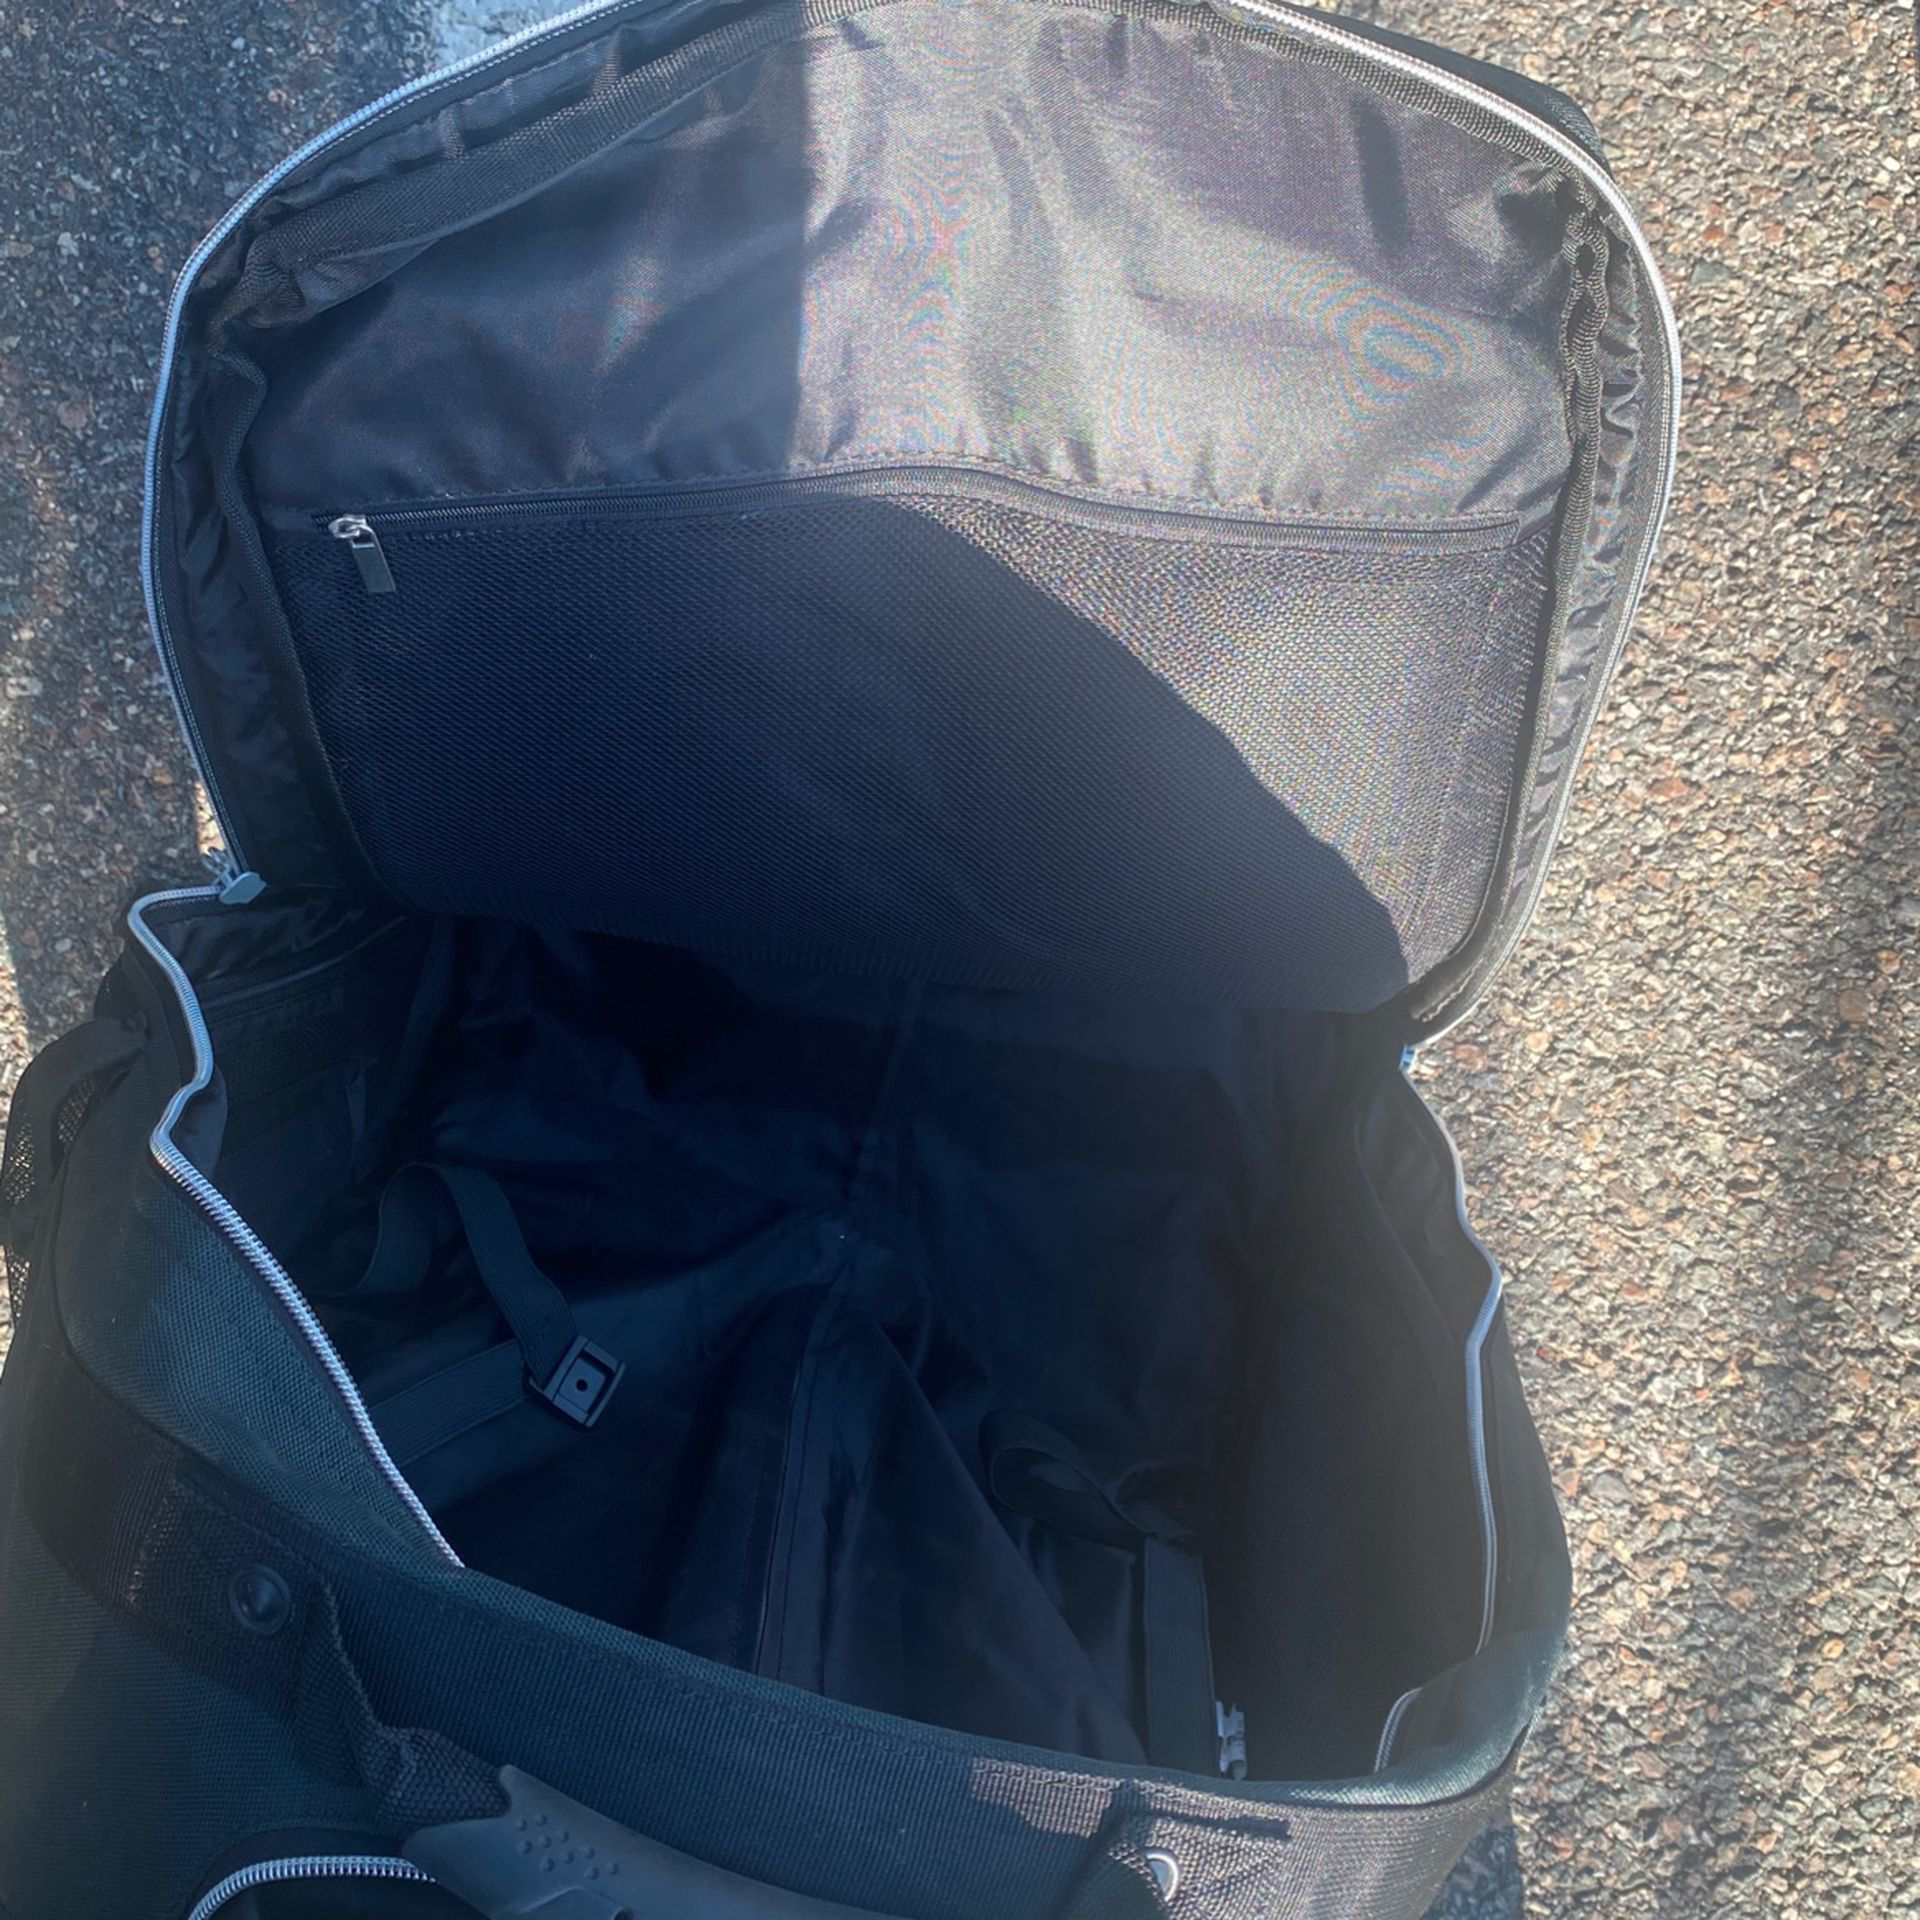 IKEA Backpack With Wheels